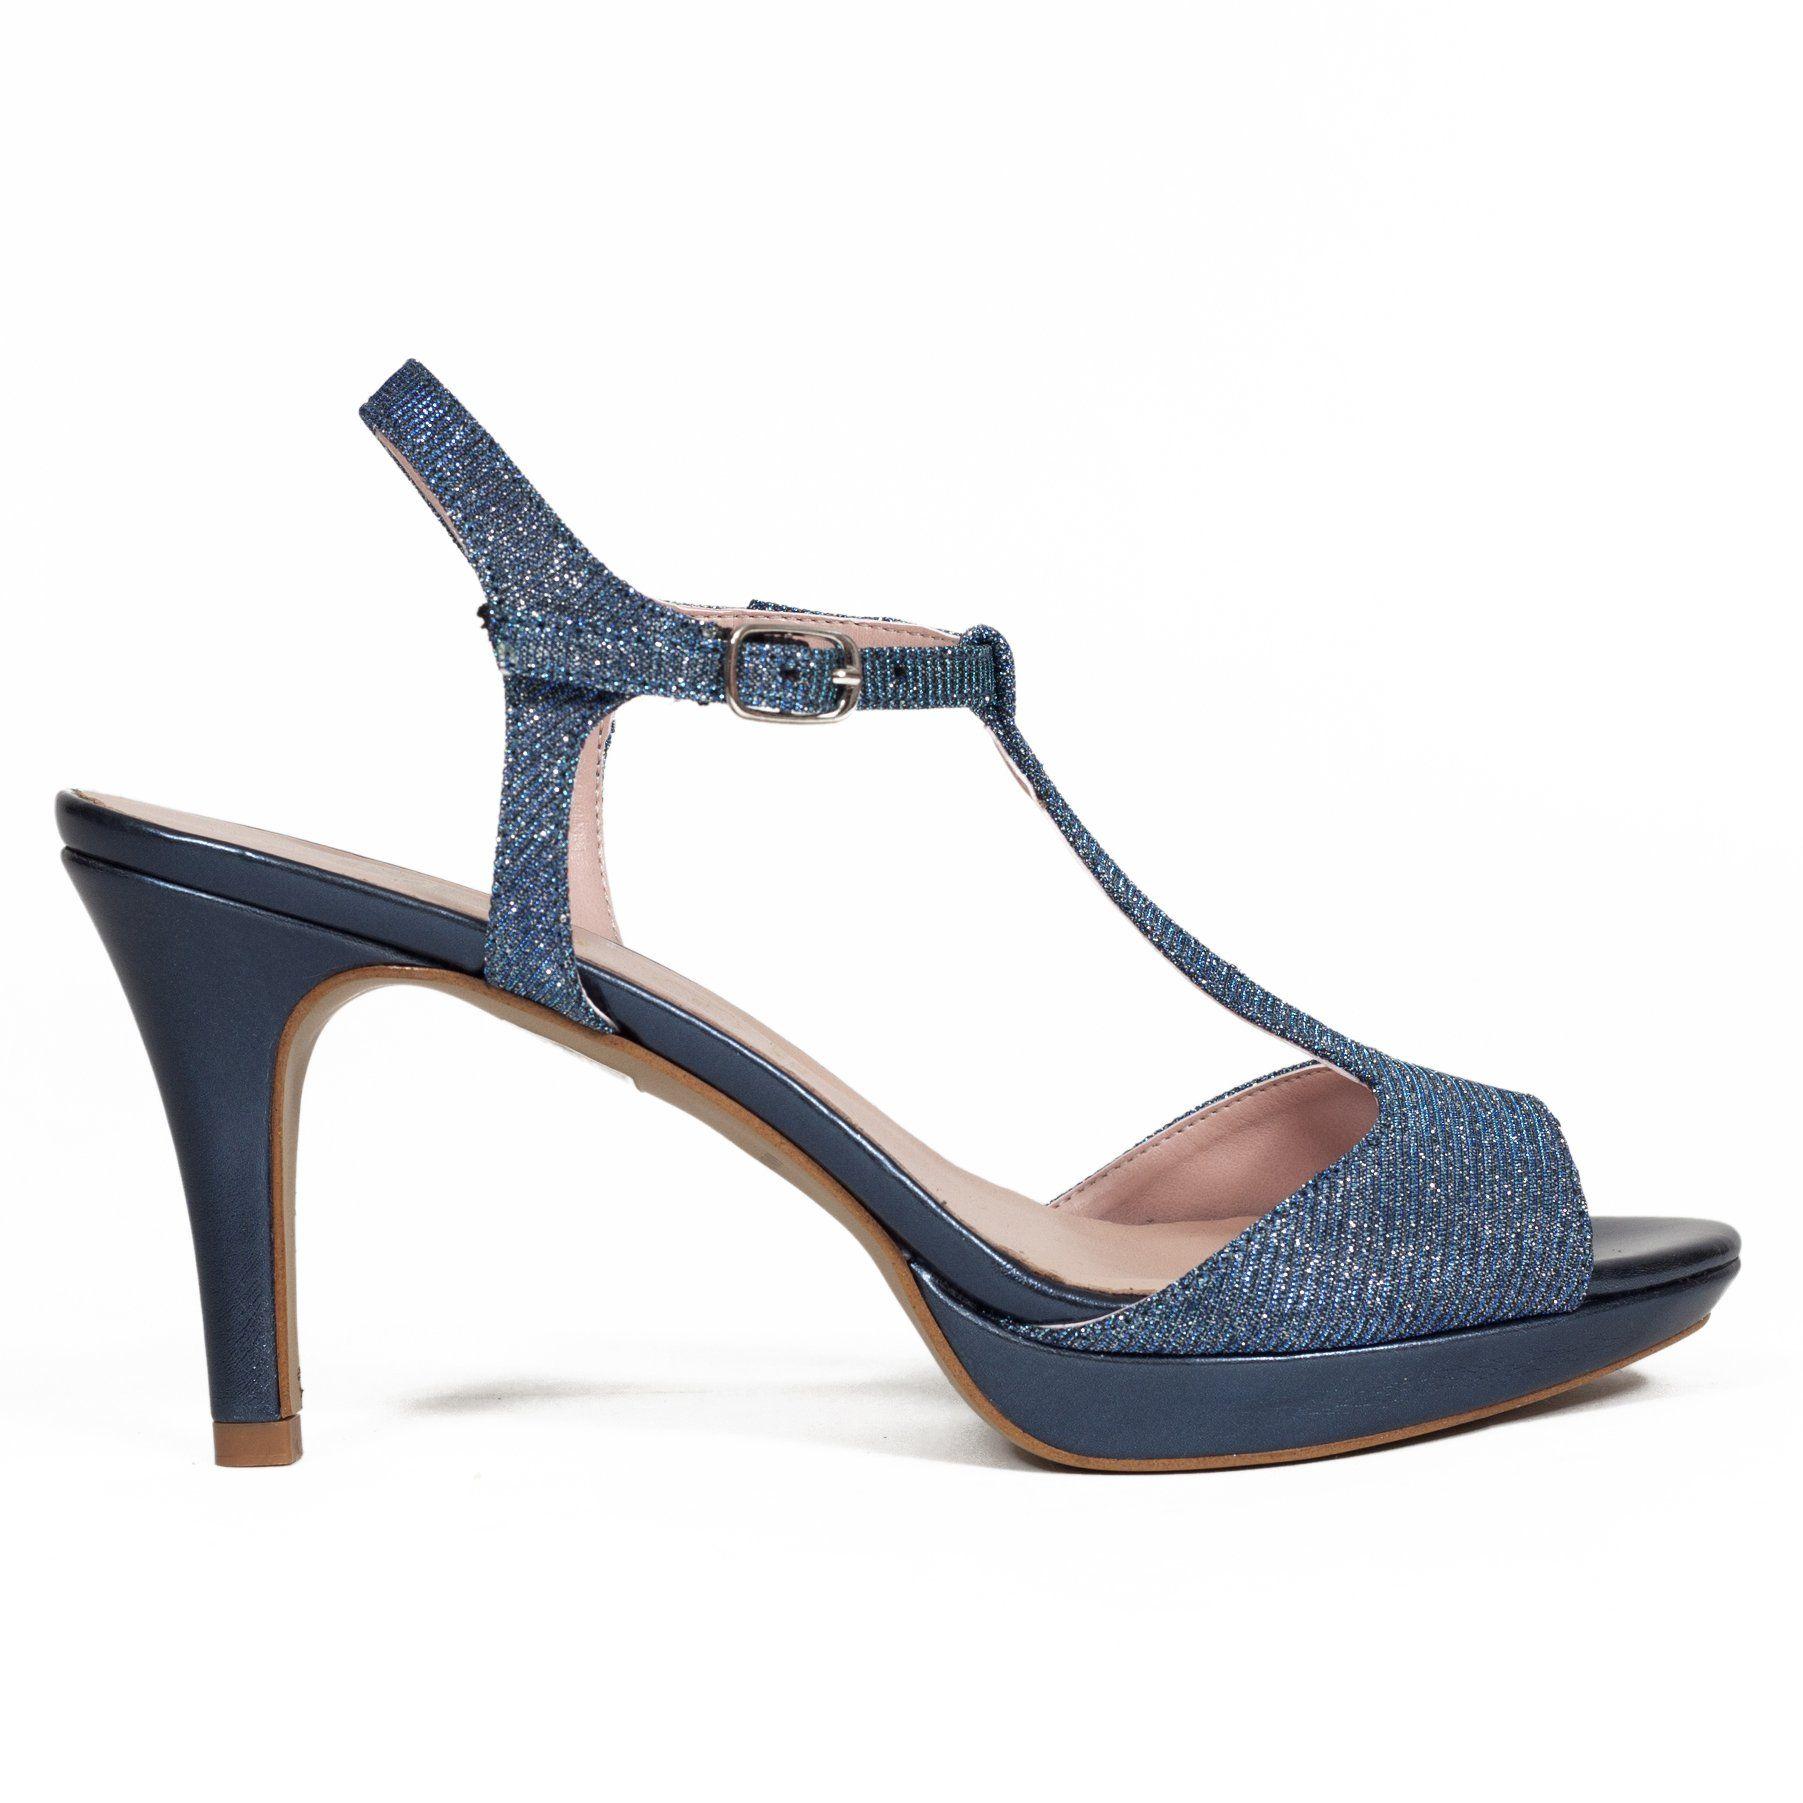 50e5957f Sandalia Fiesta DIAMANT Azul | shoes and boots | Zapatos de fiesta ...